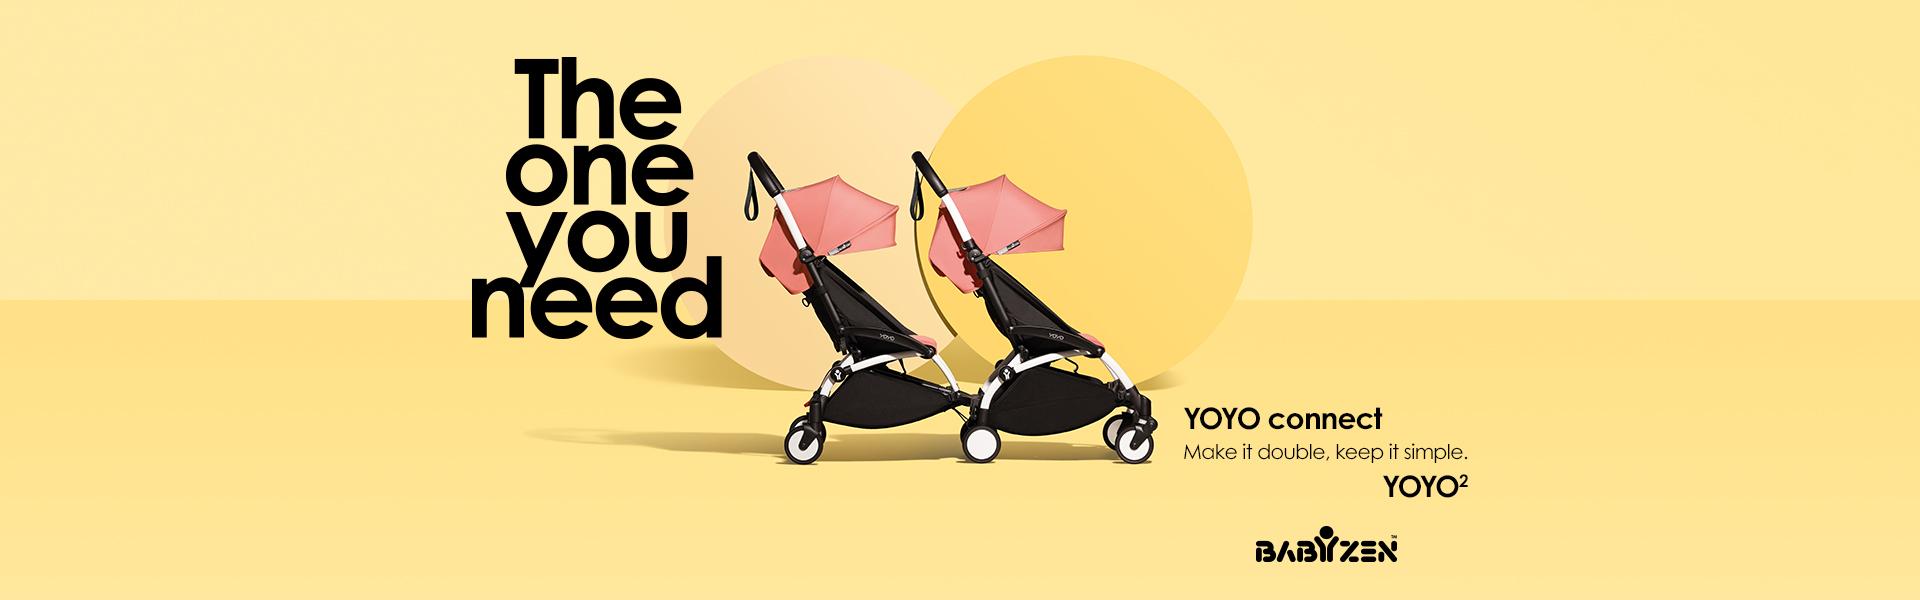 Babyzen YOYO Connect